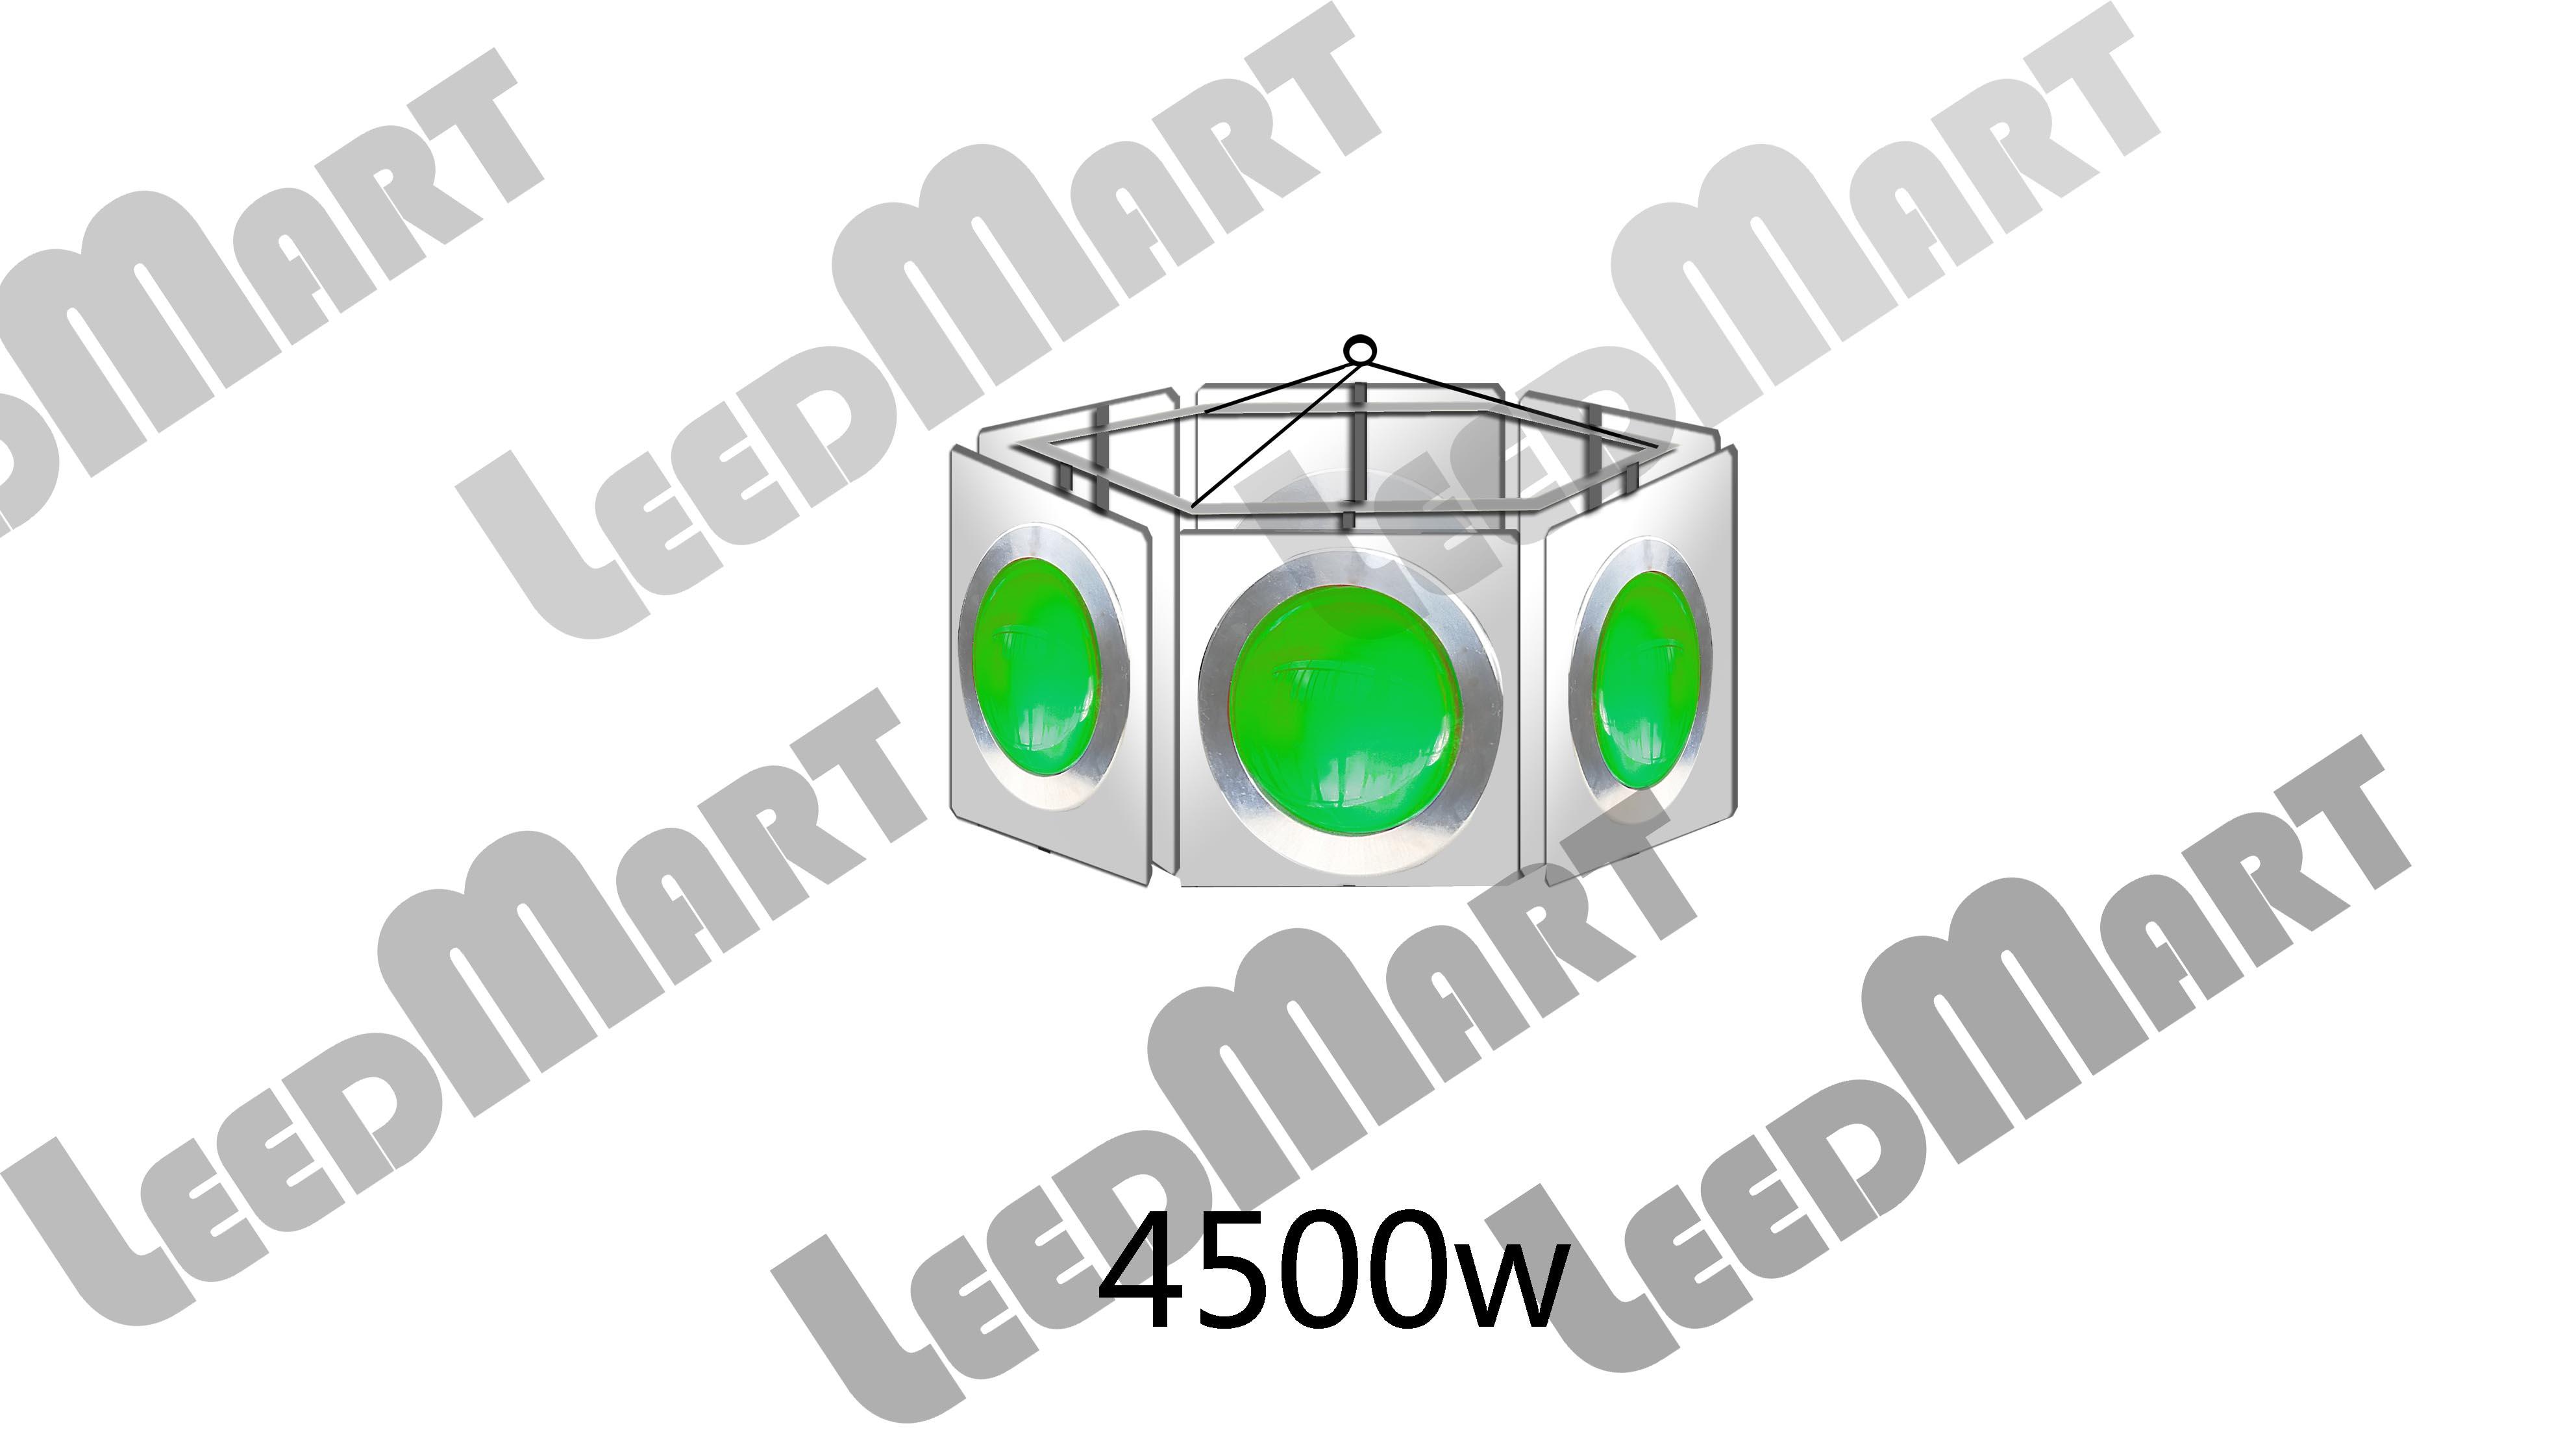 Underwater 300M high power LED fishing light attractor IP68 good quality 4500 watt-10500 watt 1260000 lumen innovative design